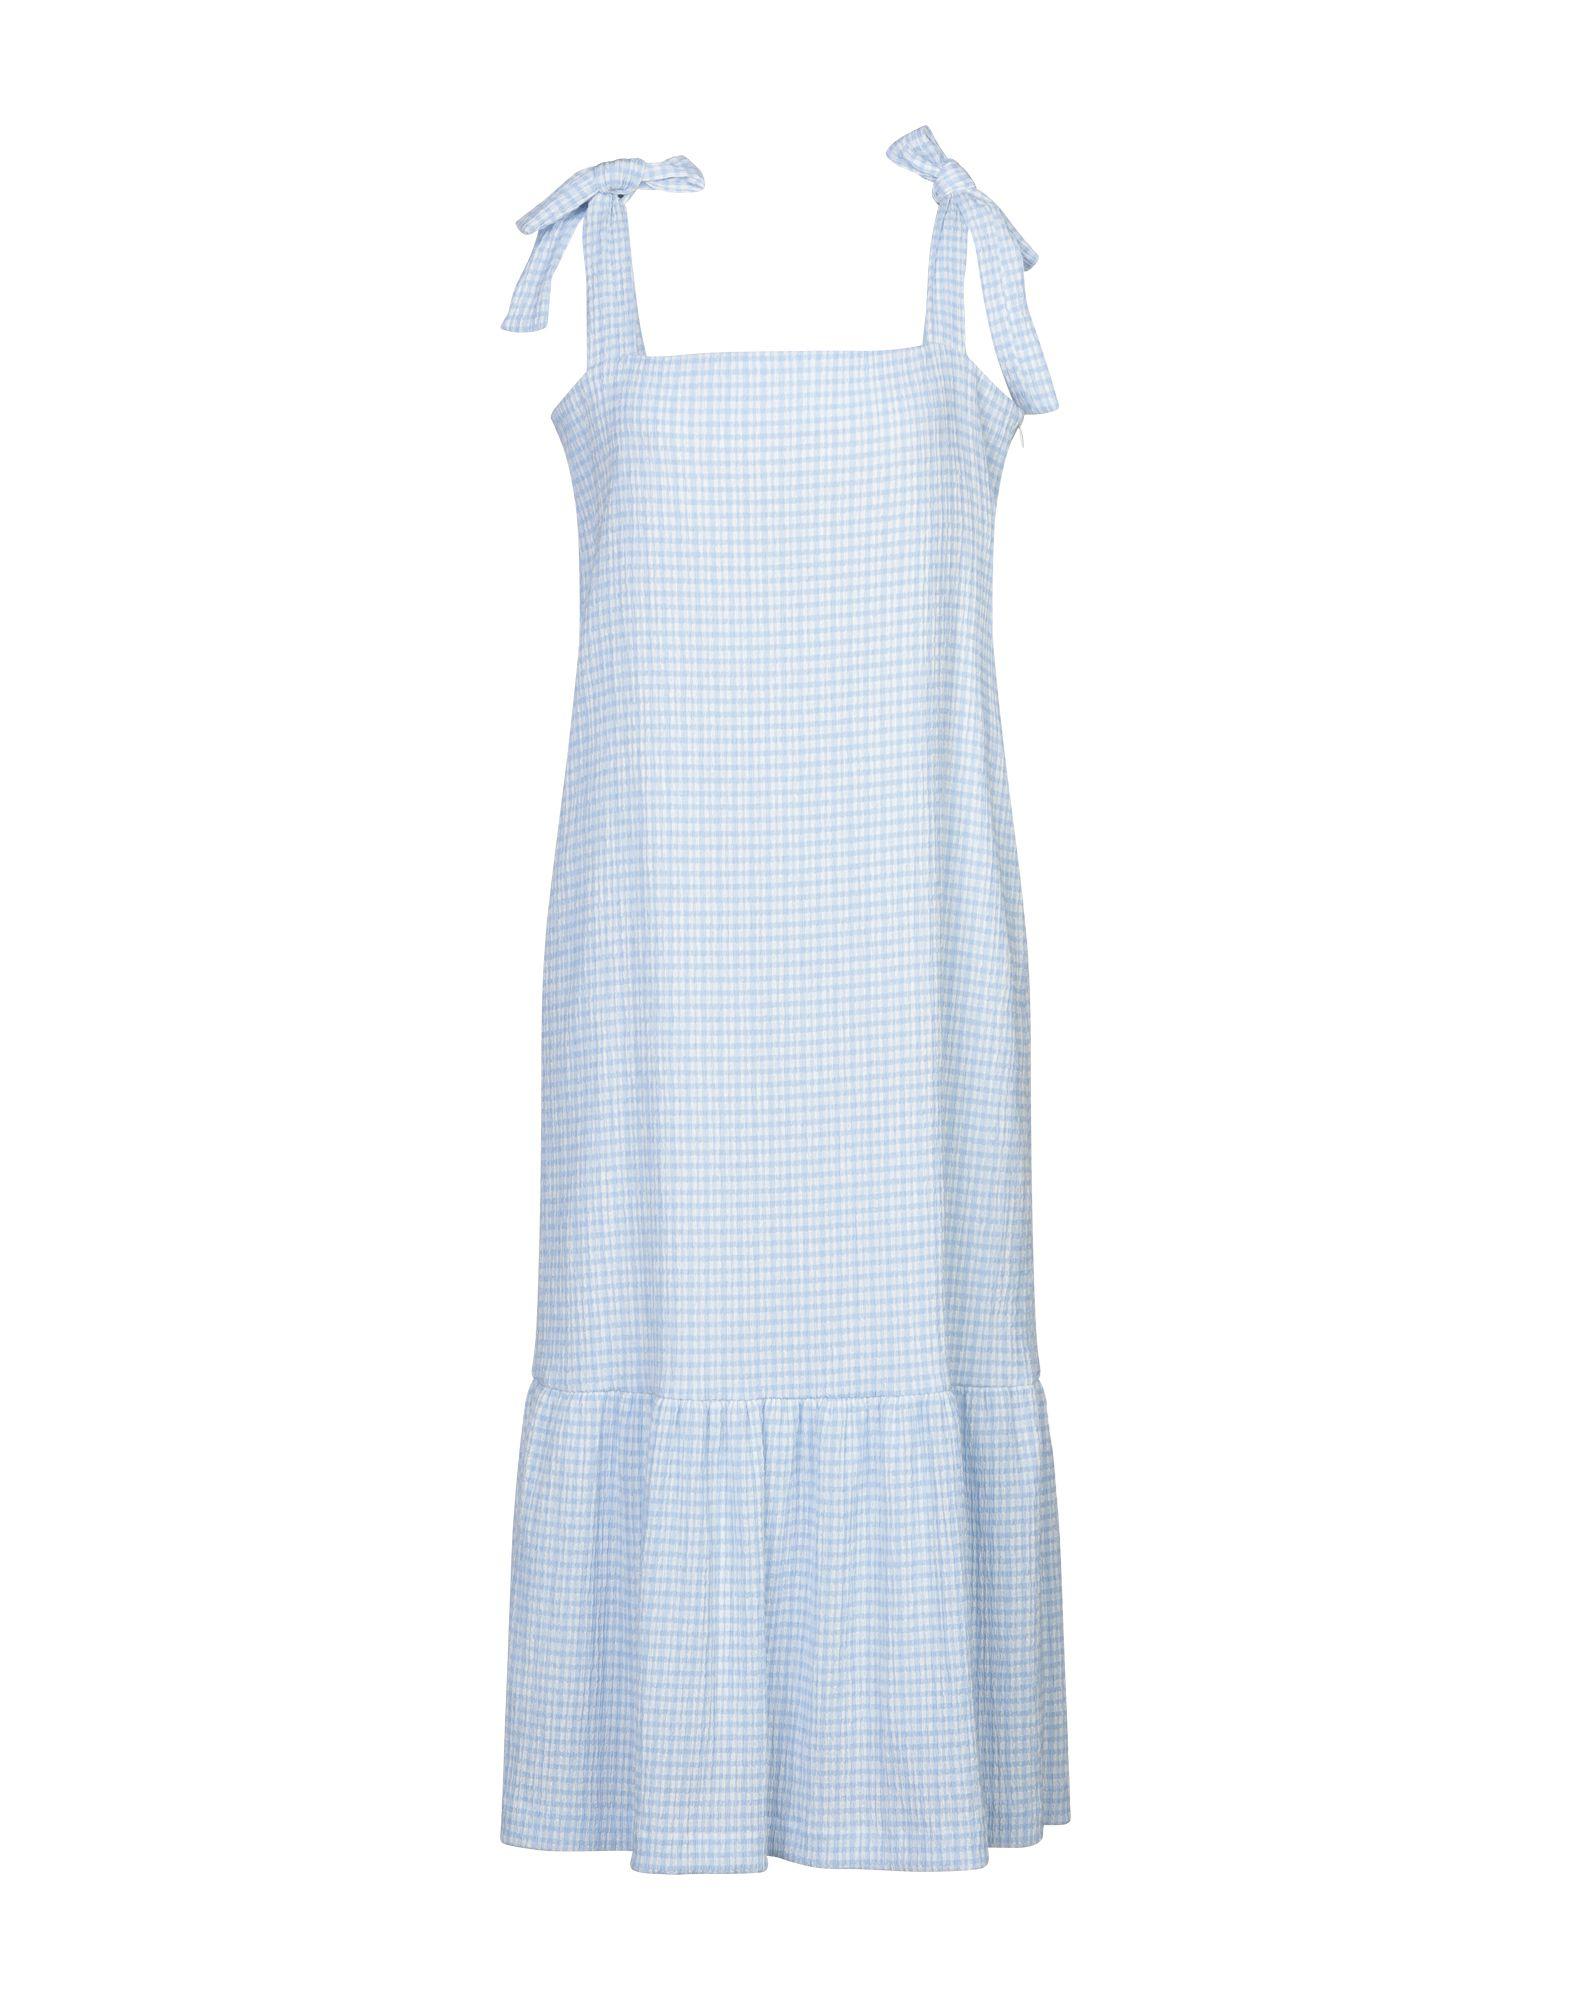 HARRIS WHARF LONDON Платье длиной 3/4